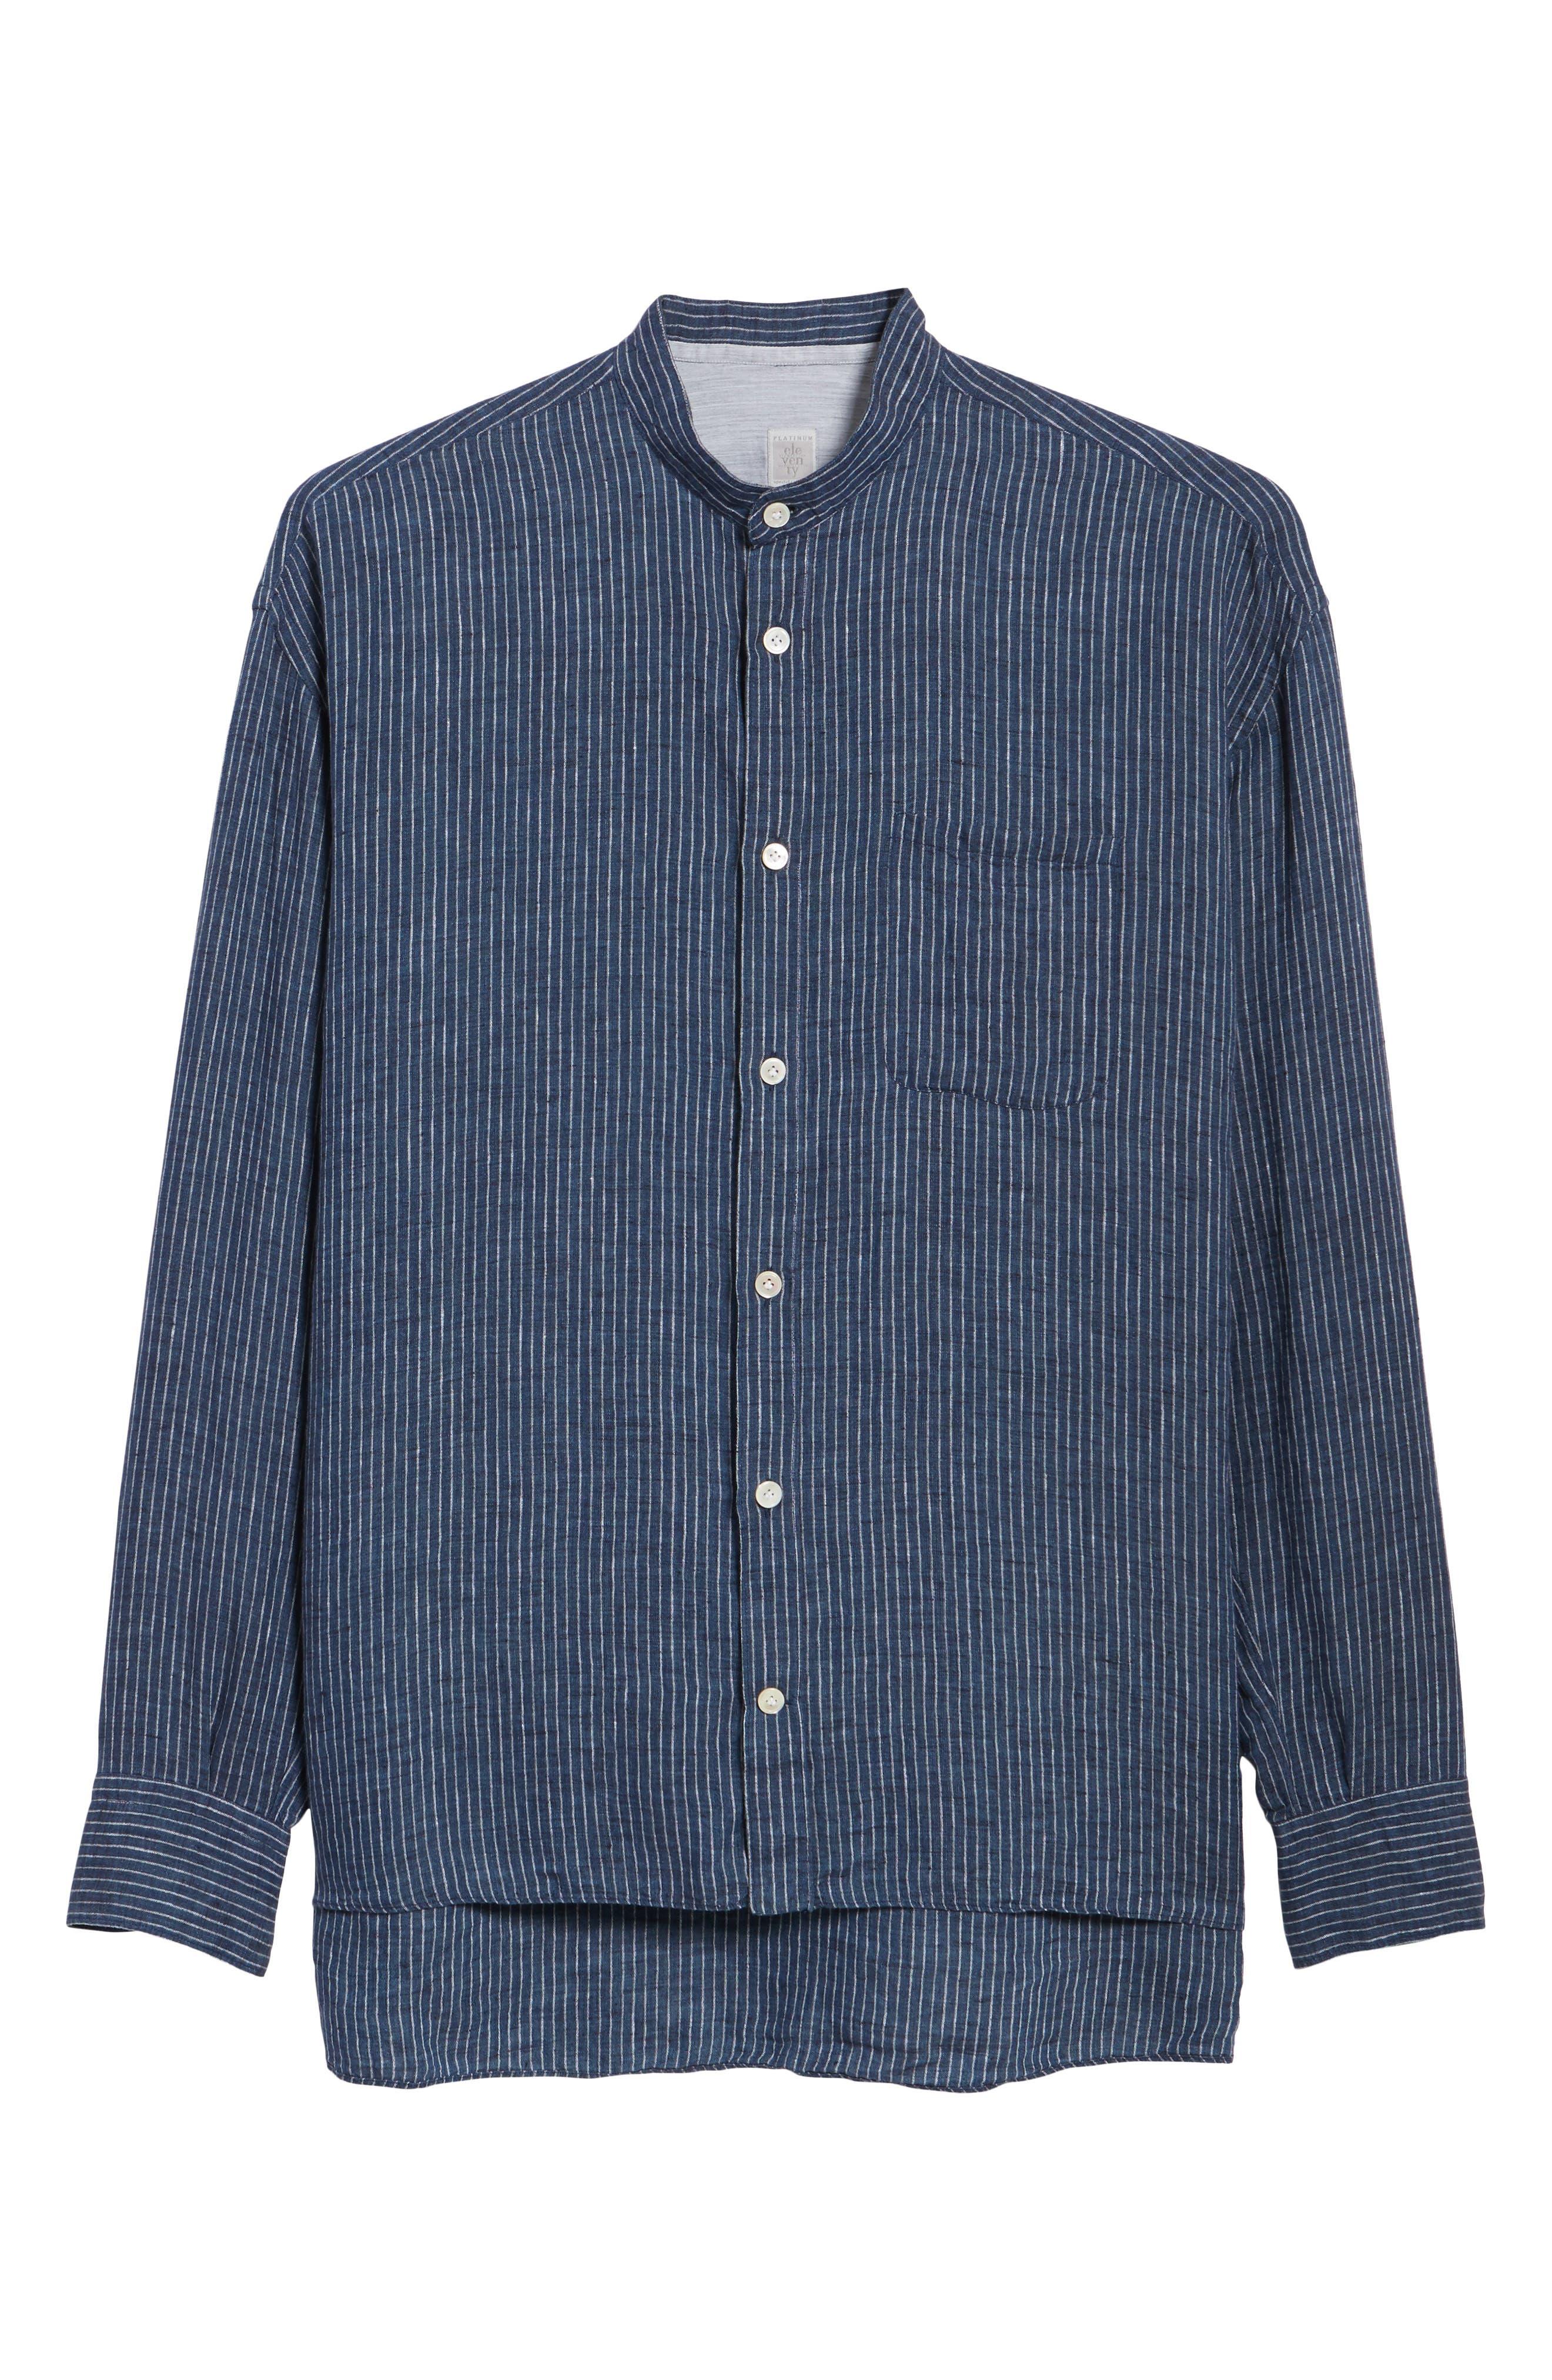 Railroad Stripe Linen Sport Shirt,                             Alternate thumbnail 6, color,                             410